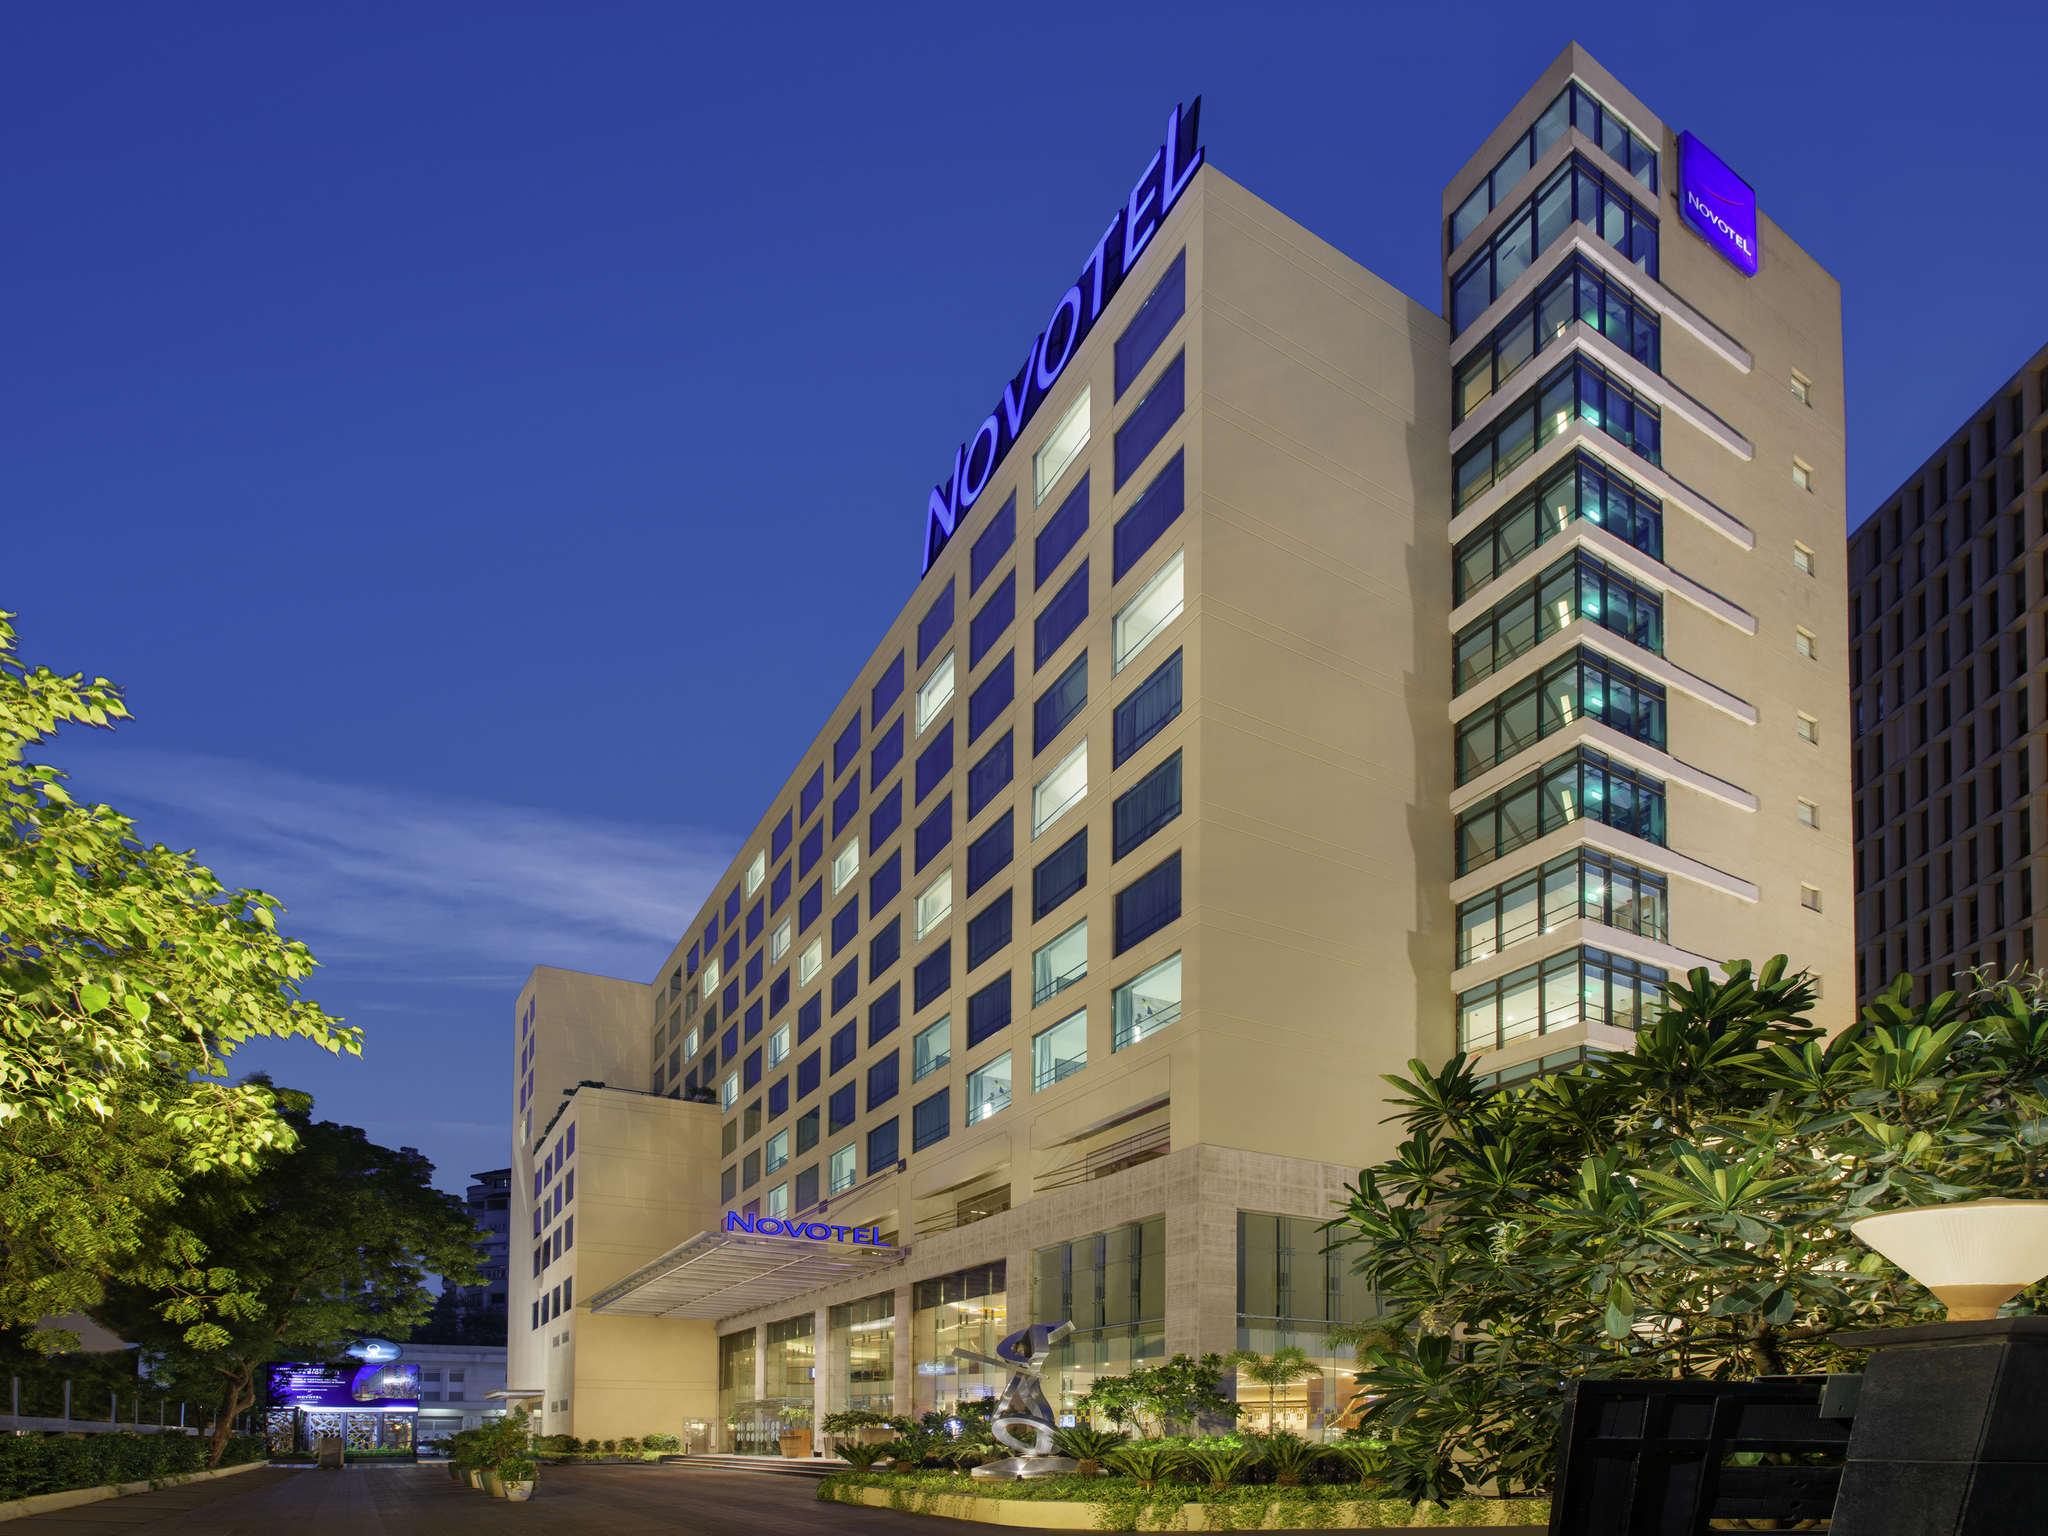 Business Travel Hotel Novotel Ahmedabad